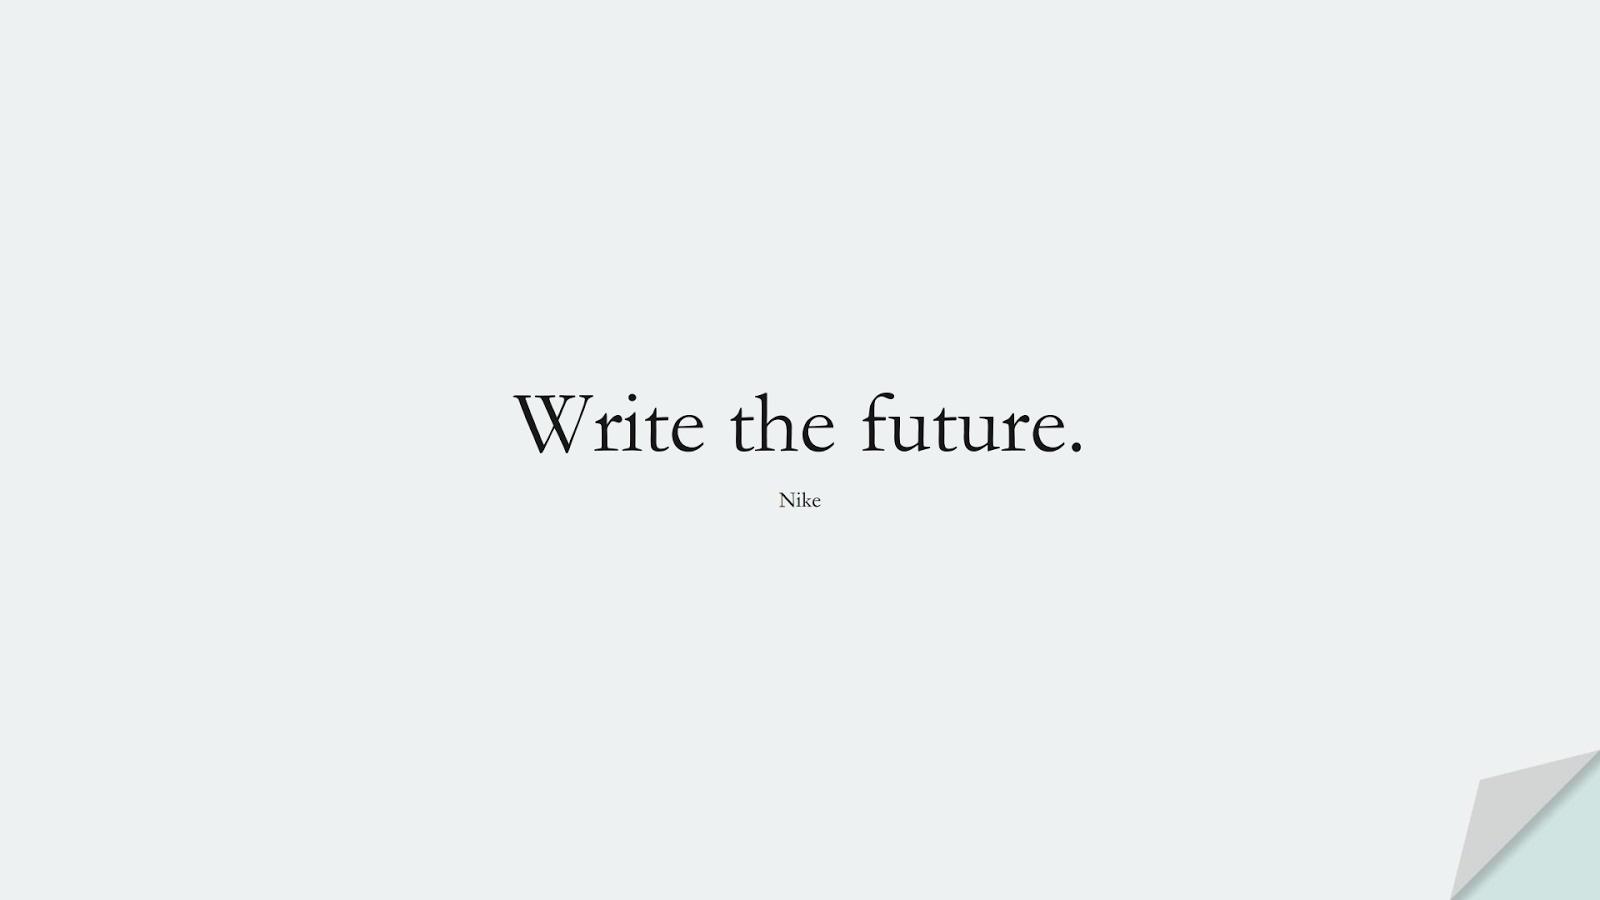 Write the future. (Nike);  #HardWorkQuotes